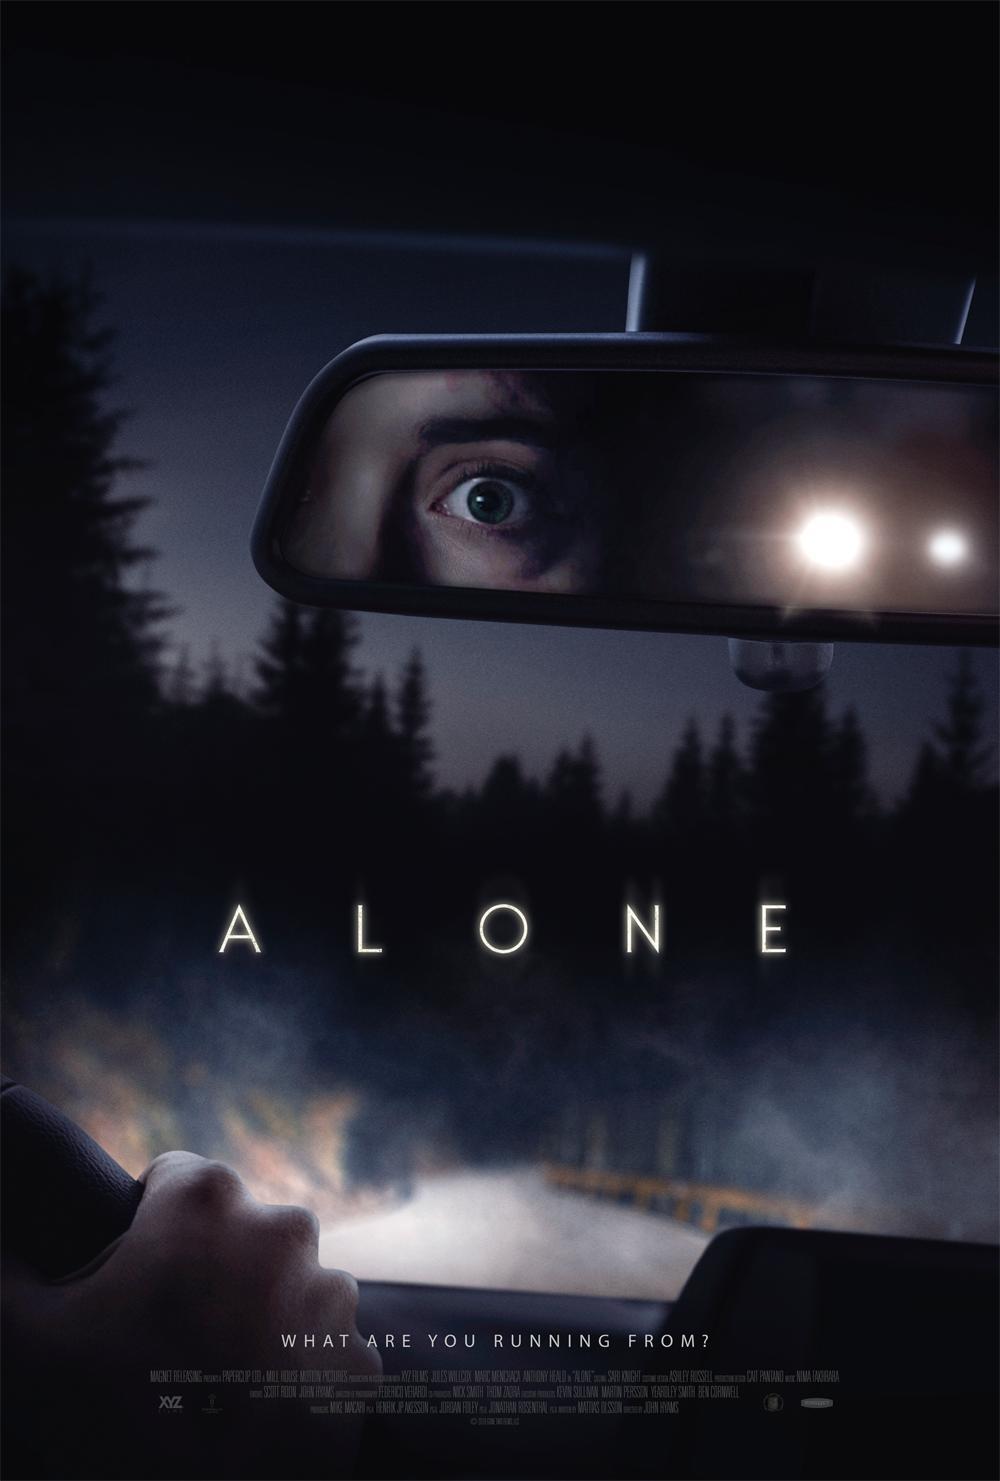 Download Filme Isolado na Pandemia (Alone) 2021 Qualidade Hd